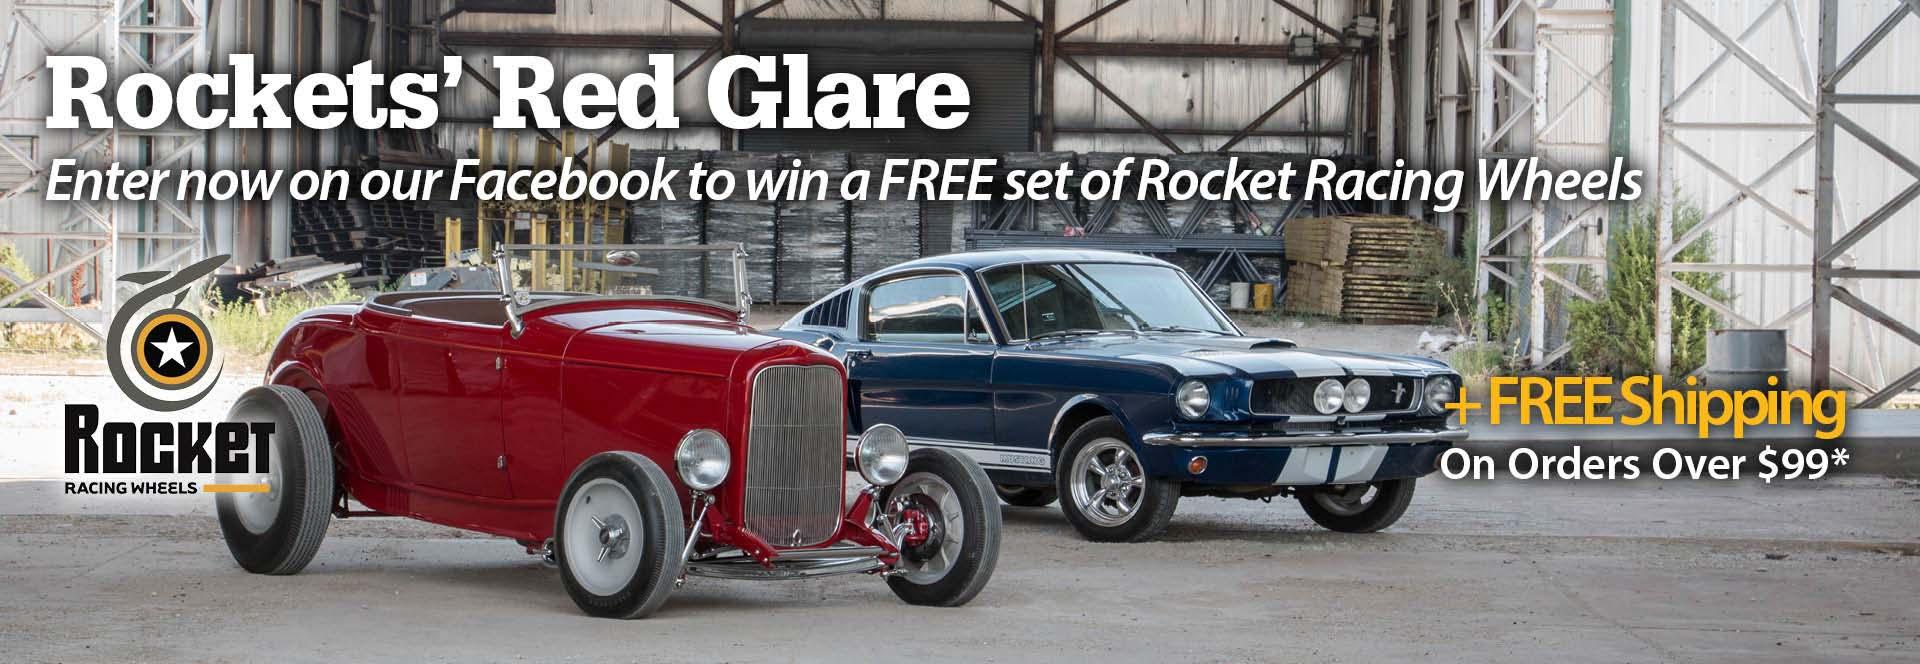 Rocket Racing Wheel Giveaway